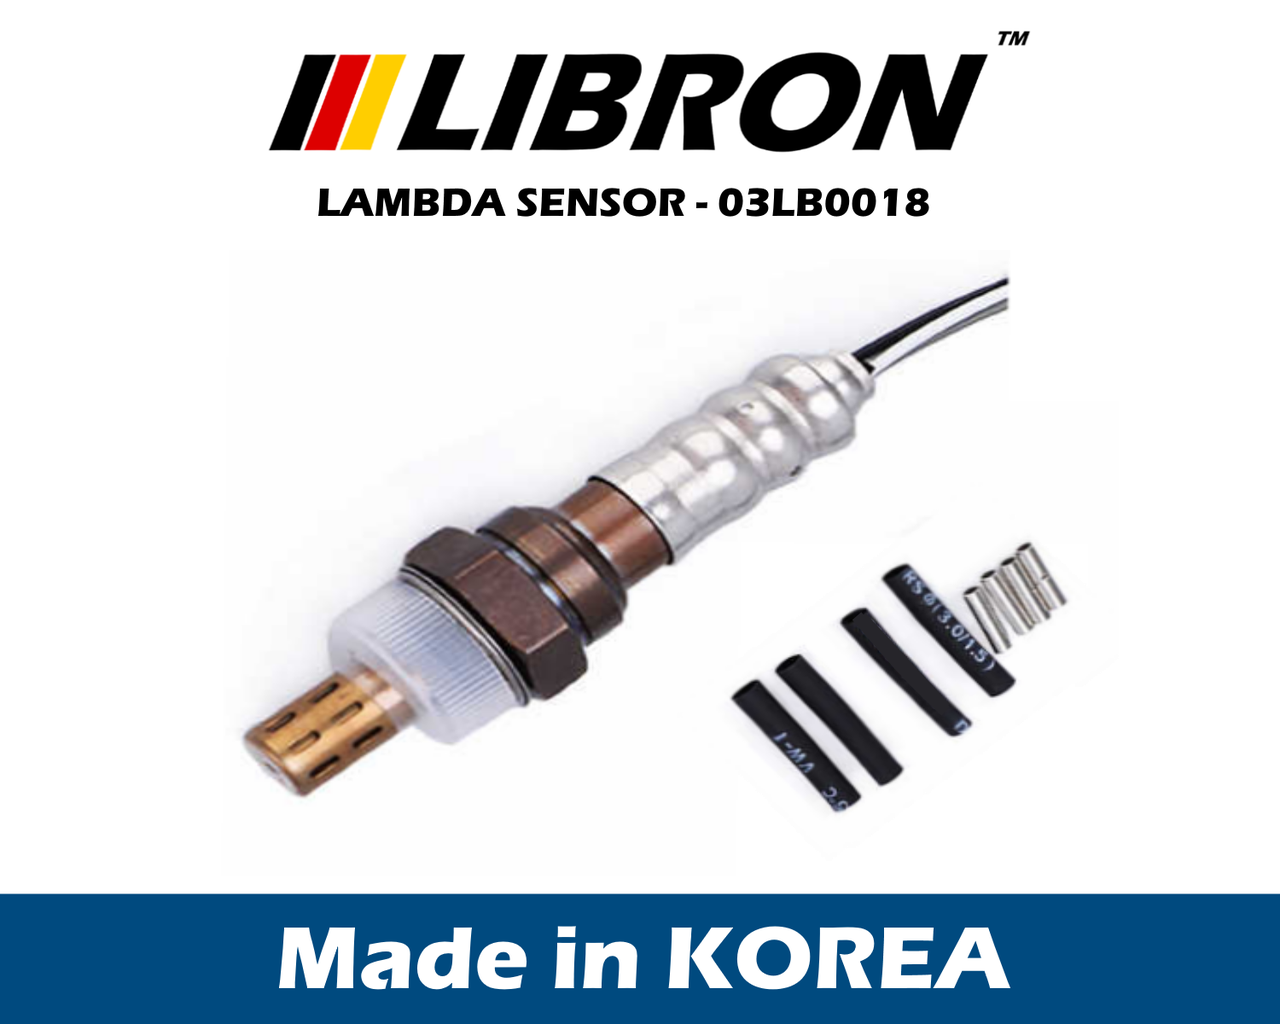 Датчик кислорода Libron 03LB0018 - Peugeot 206 седан,  306 (7B, N3, N5)